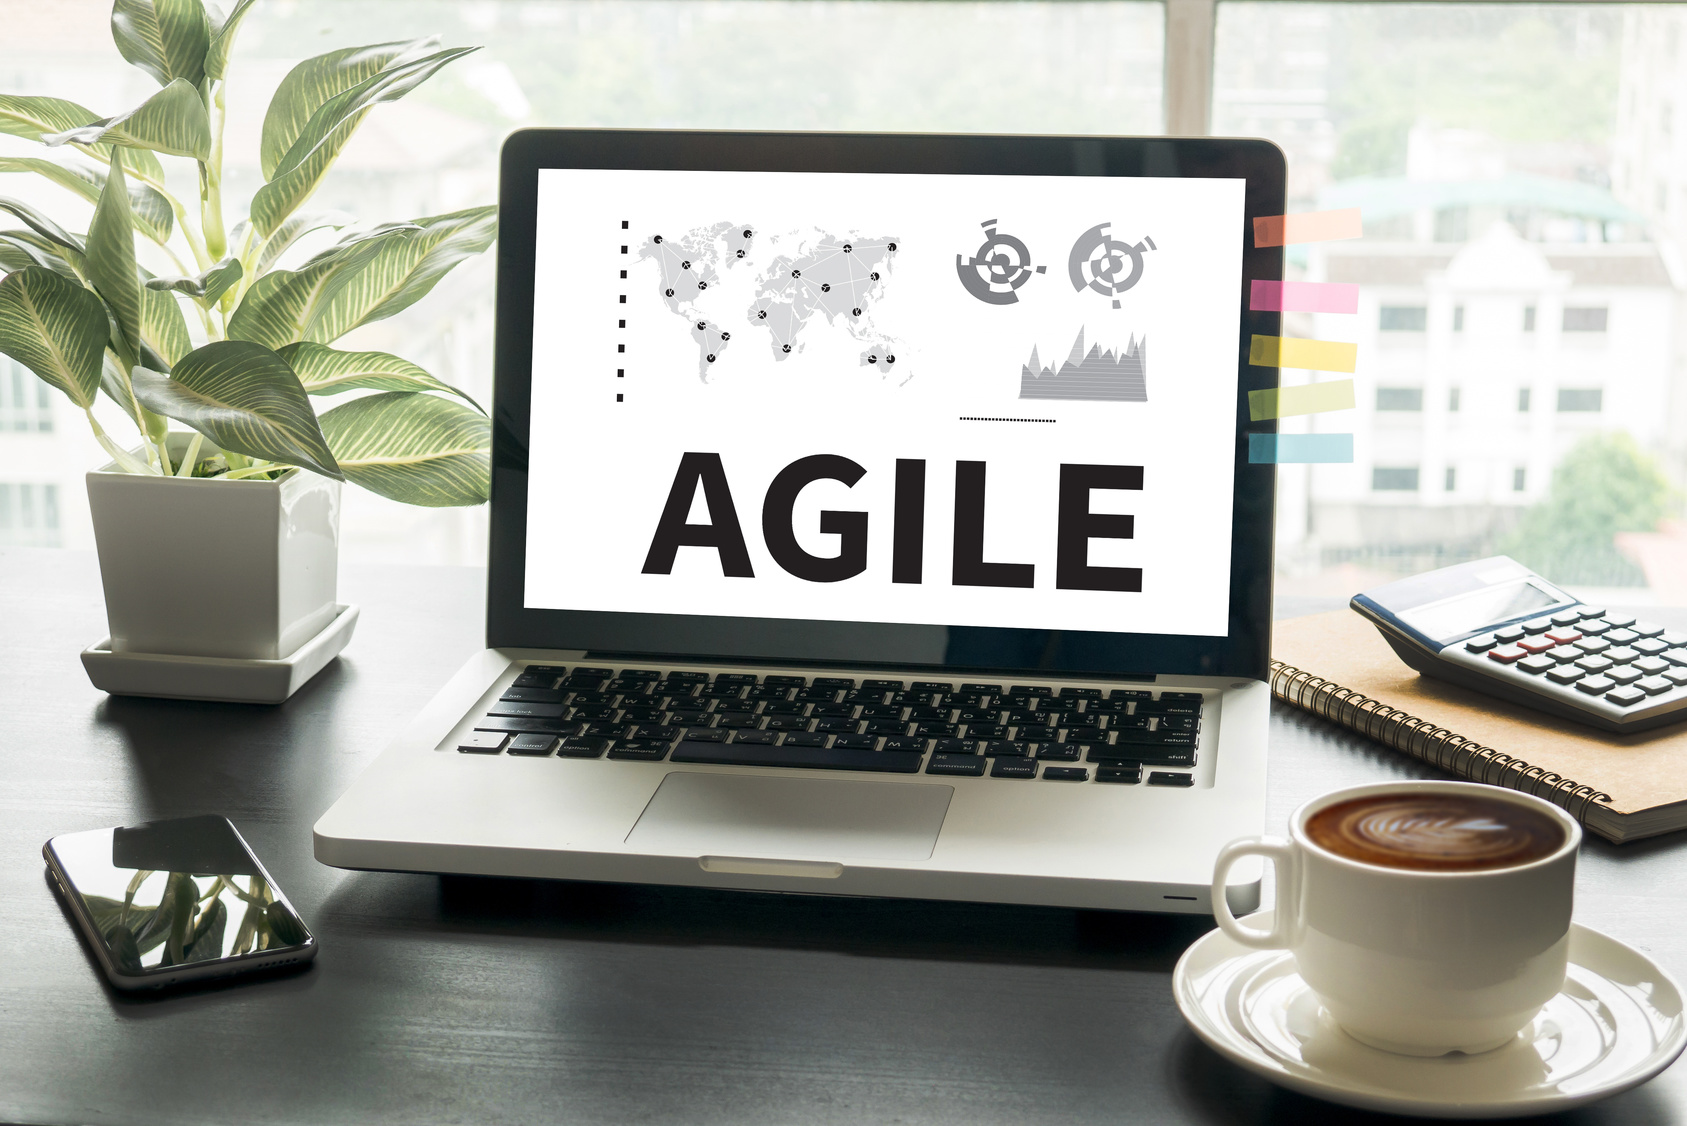 4 Key Principles of Agile Development Methodology